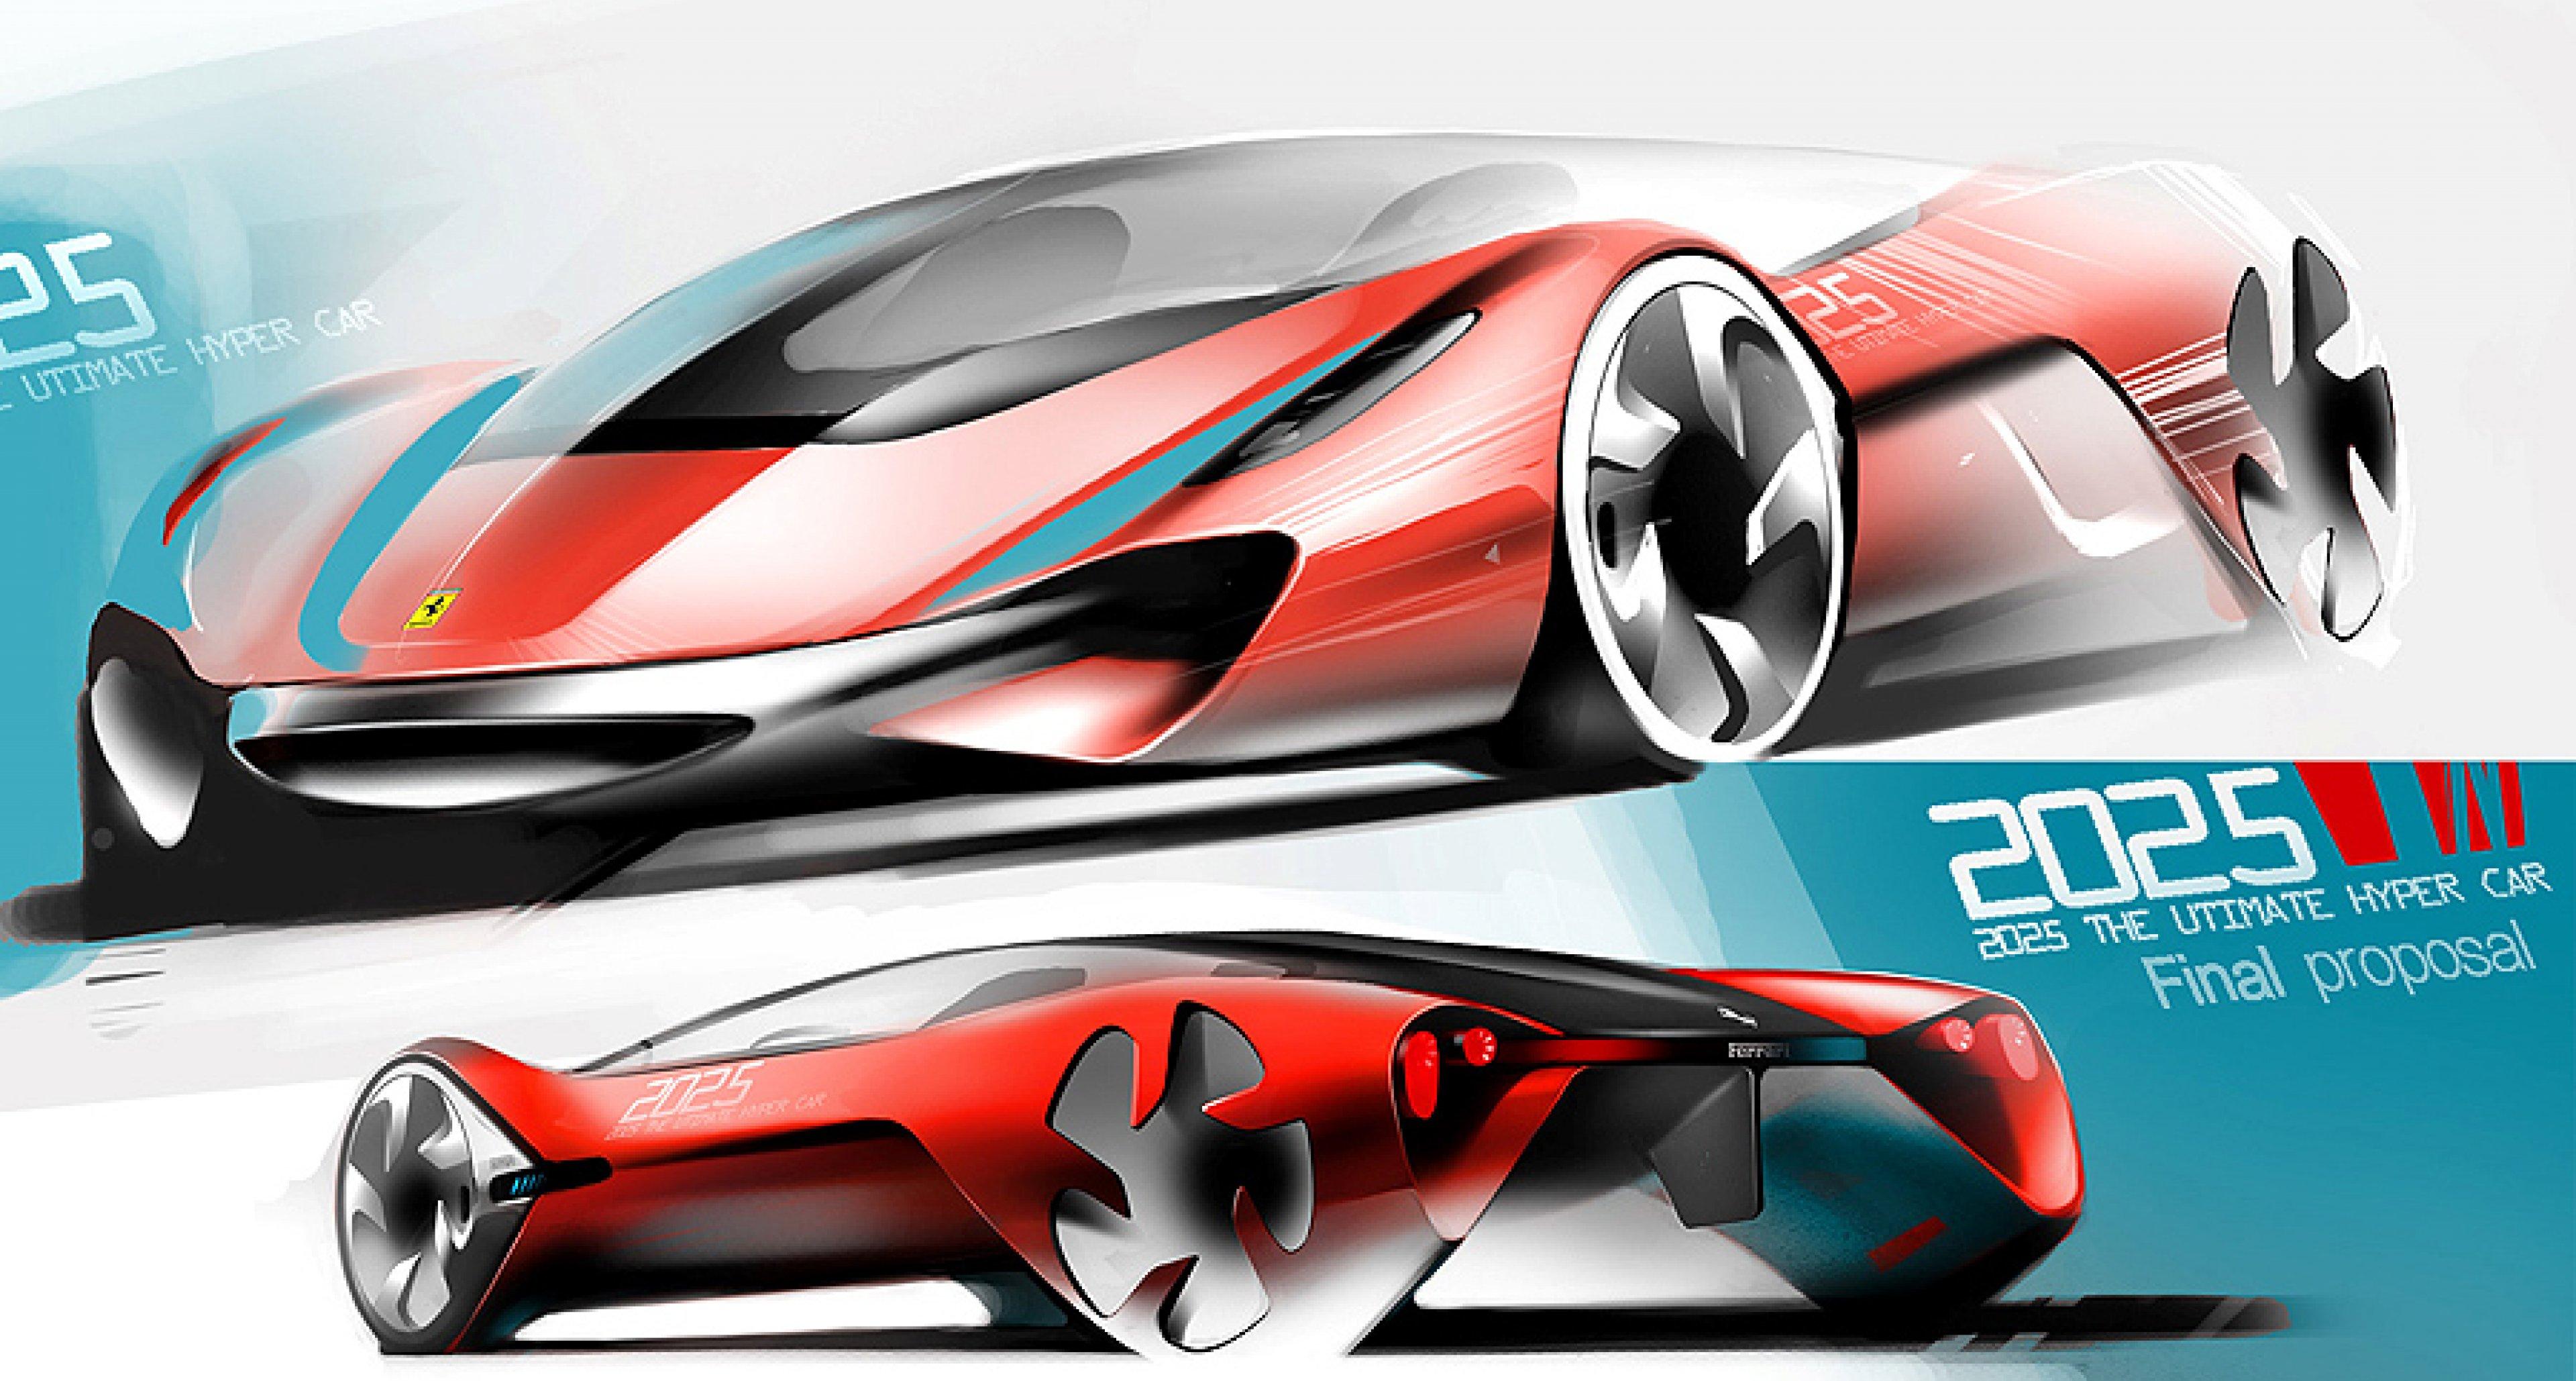 Ferrari World Design Contest 2011: Seoul's Hongik University wins the challenge